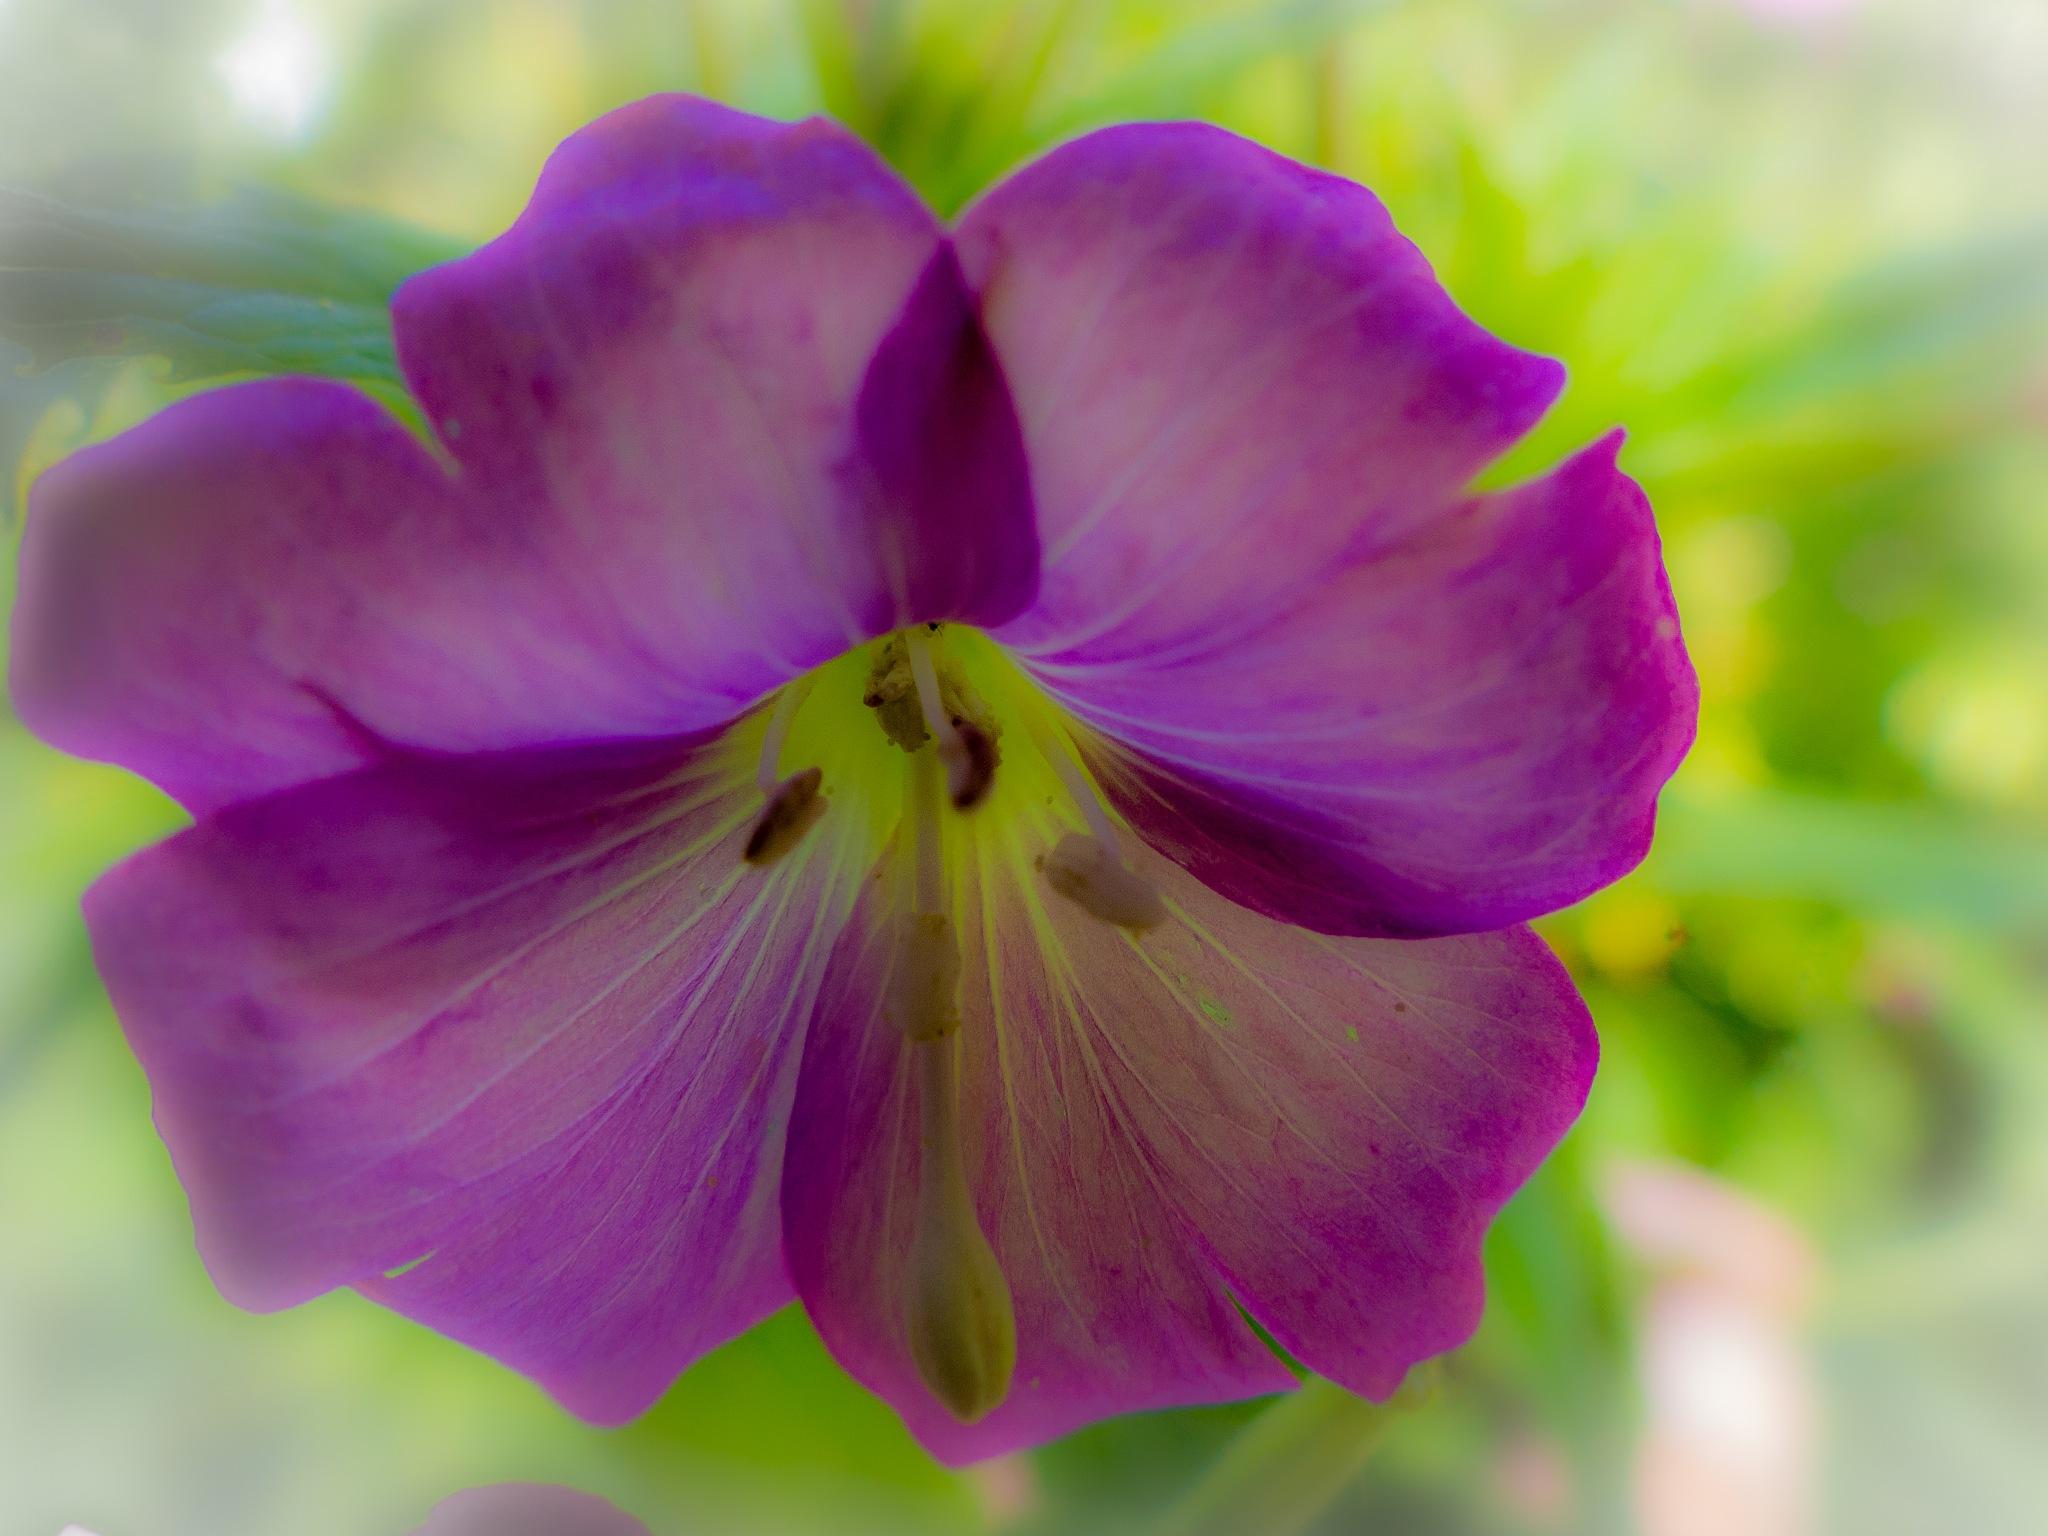 flower 2 by Paul Geutjes